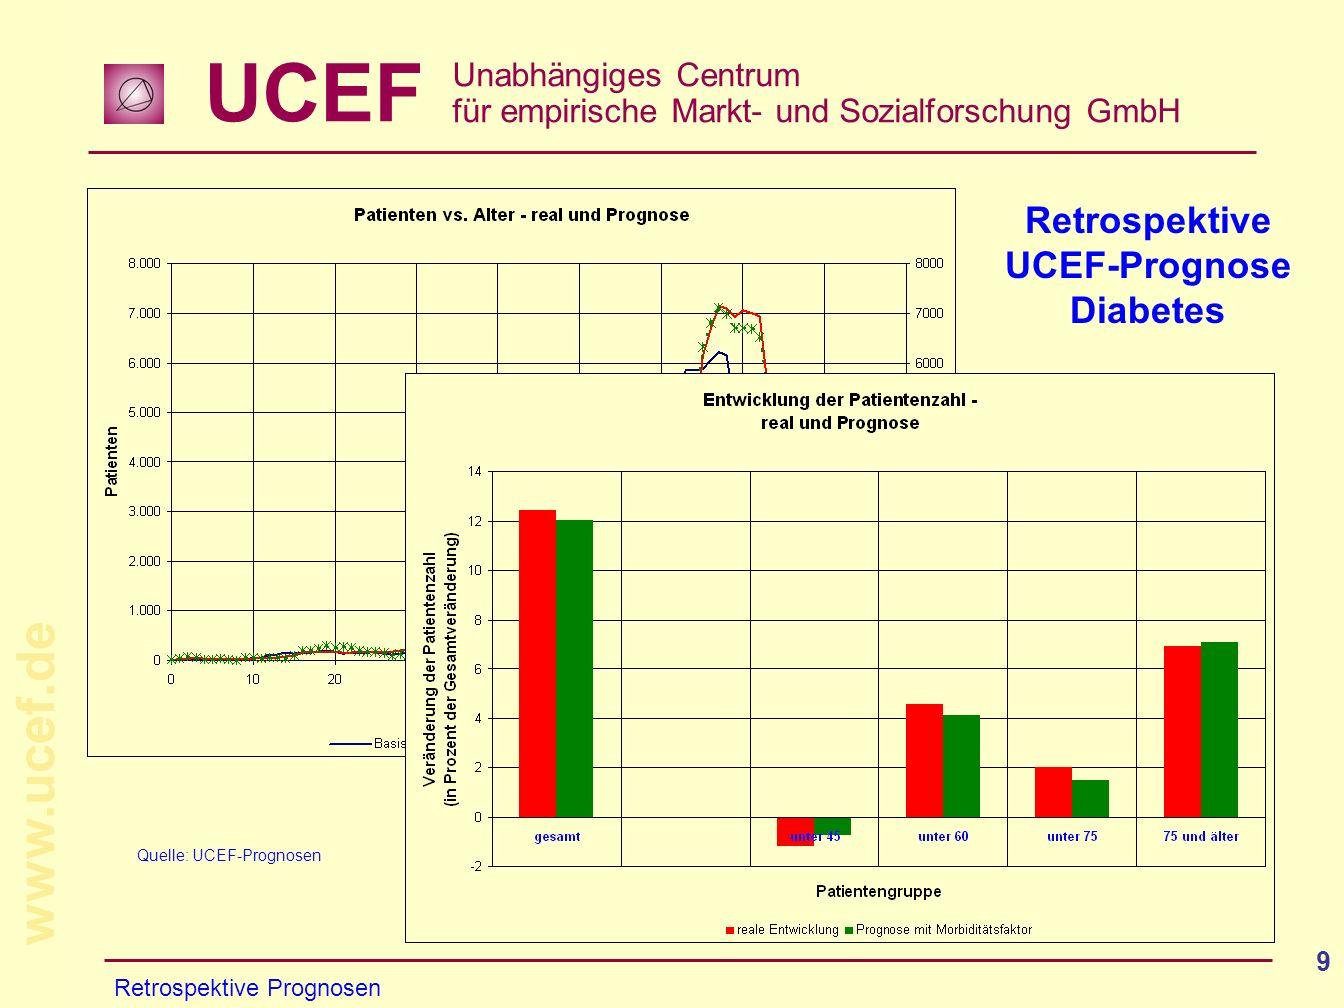 Quelle: UCEF-Prognosen